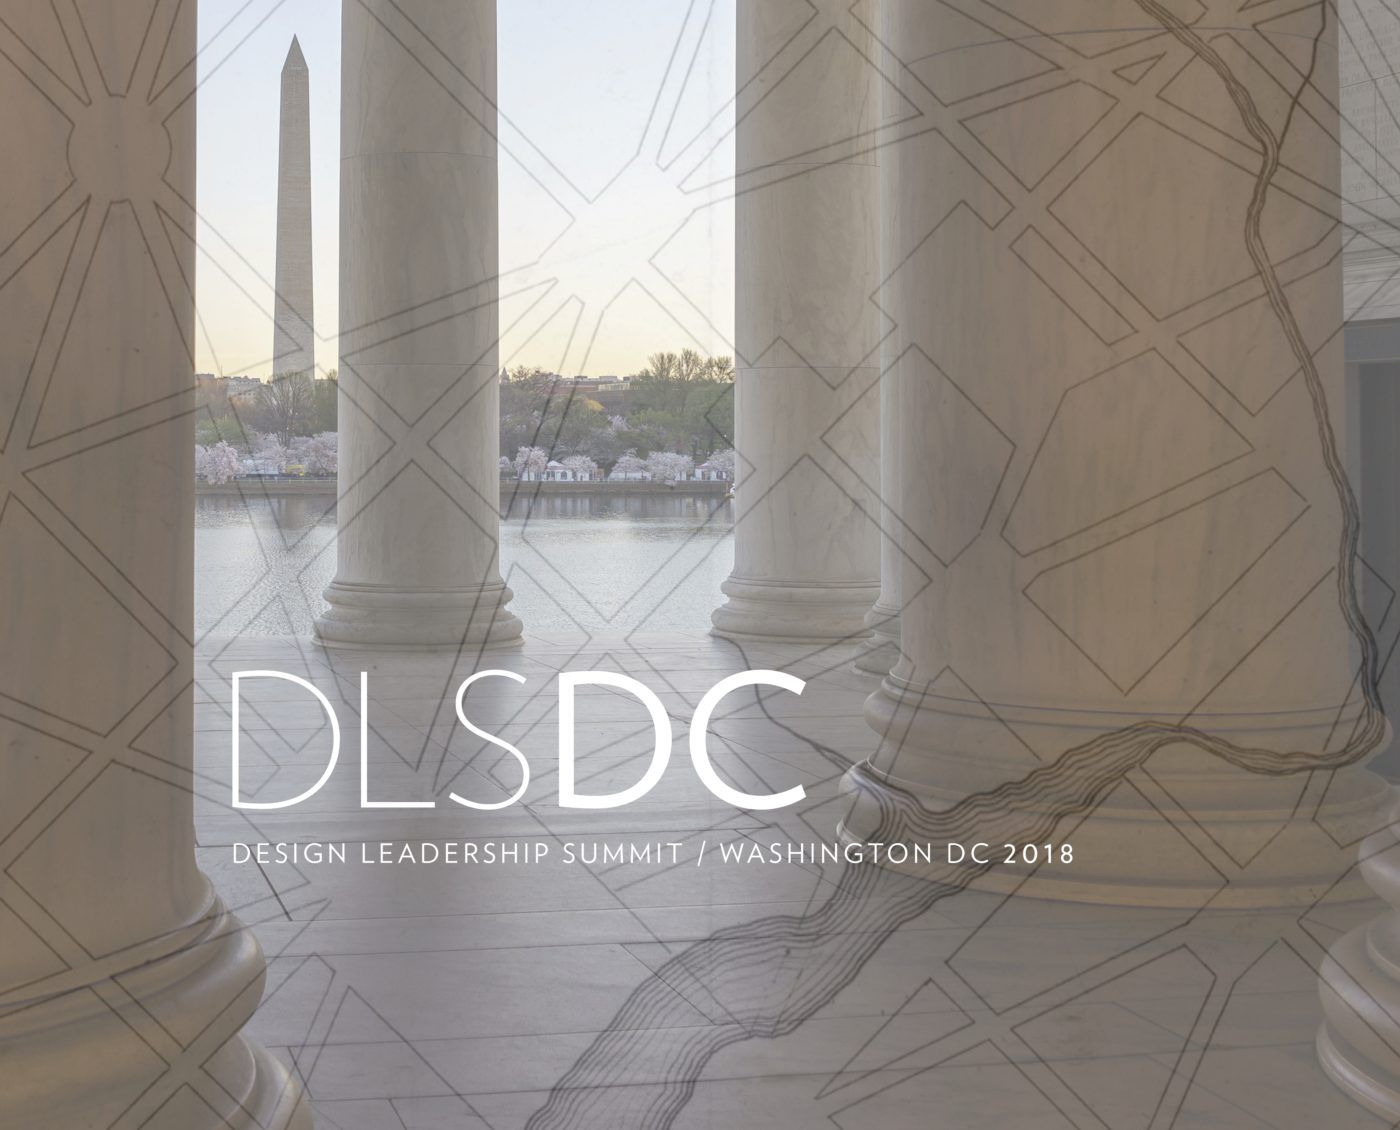 2018 Design Leadership Summit: Washington, D.C.